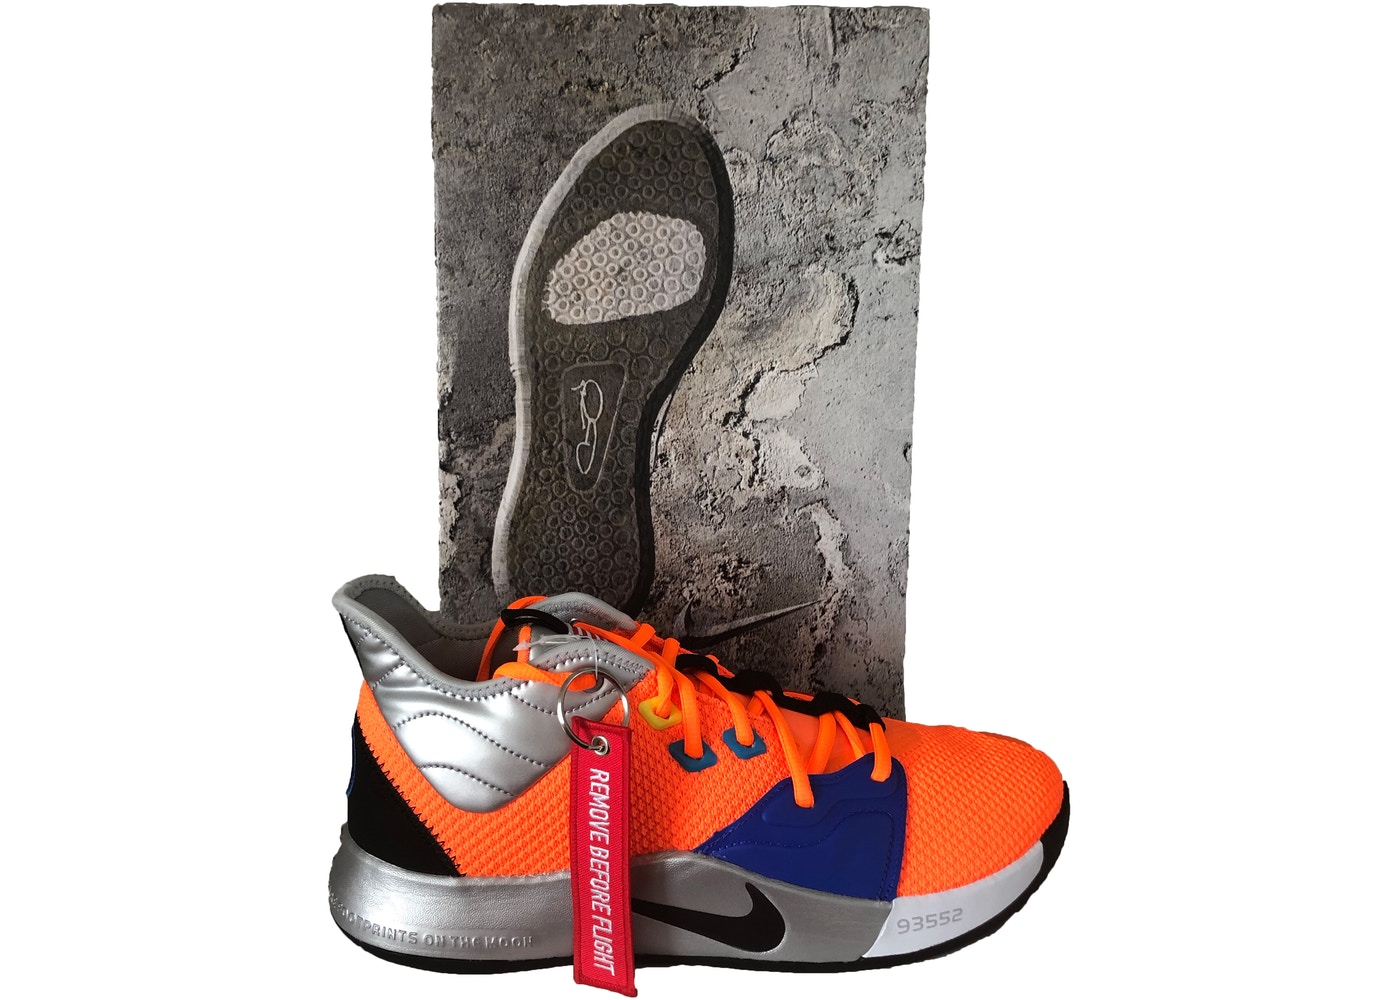 7a8262ad8fac1 HypeAnalyzer · Nike PG 3 NASA (Finishline Special Box)